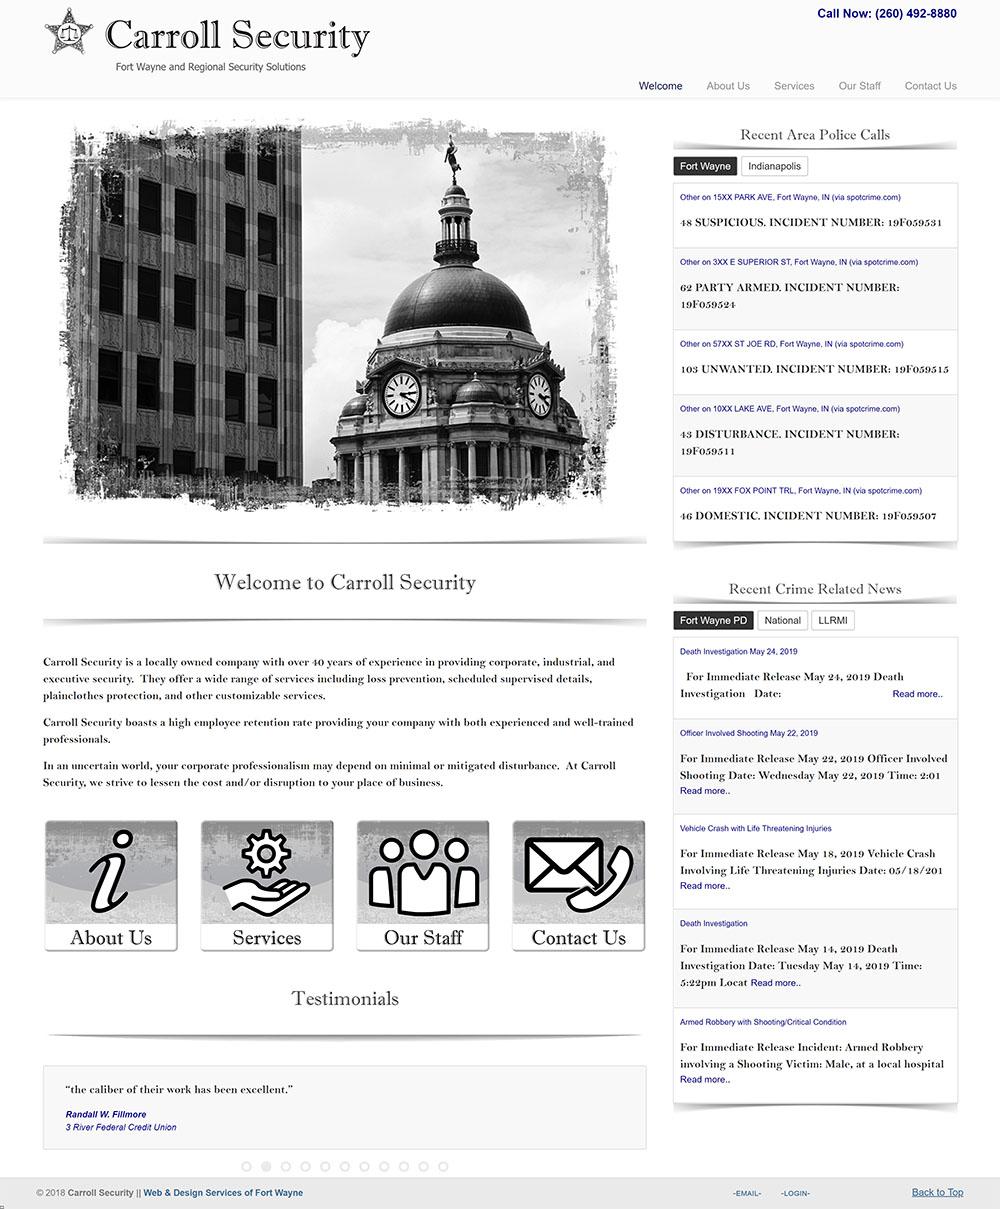 Screenshot of Carroll Security website